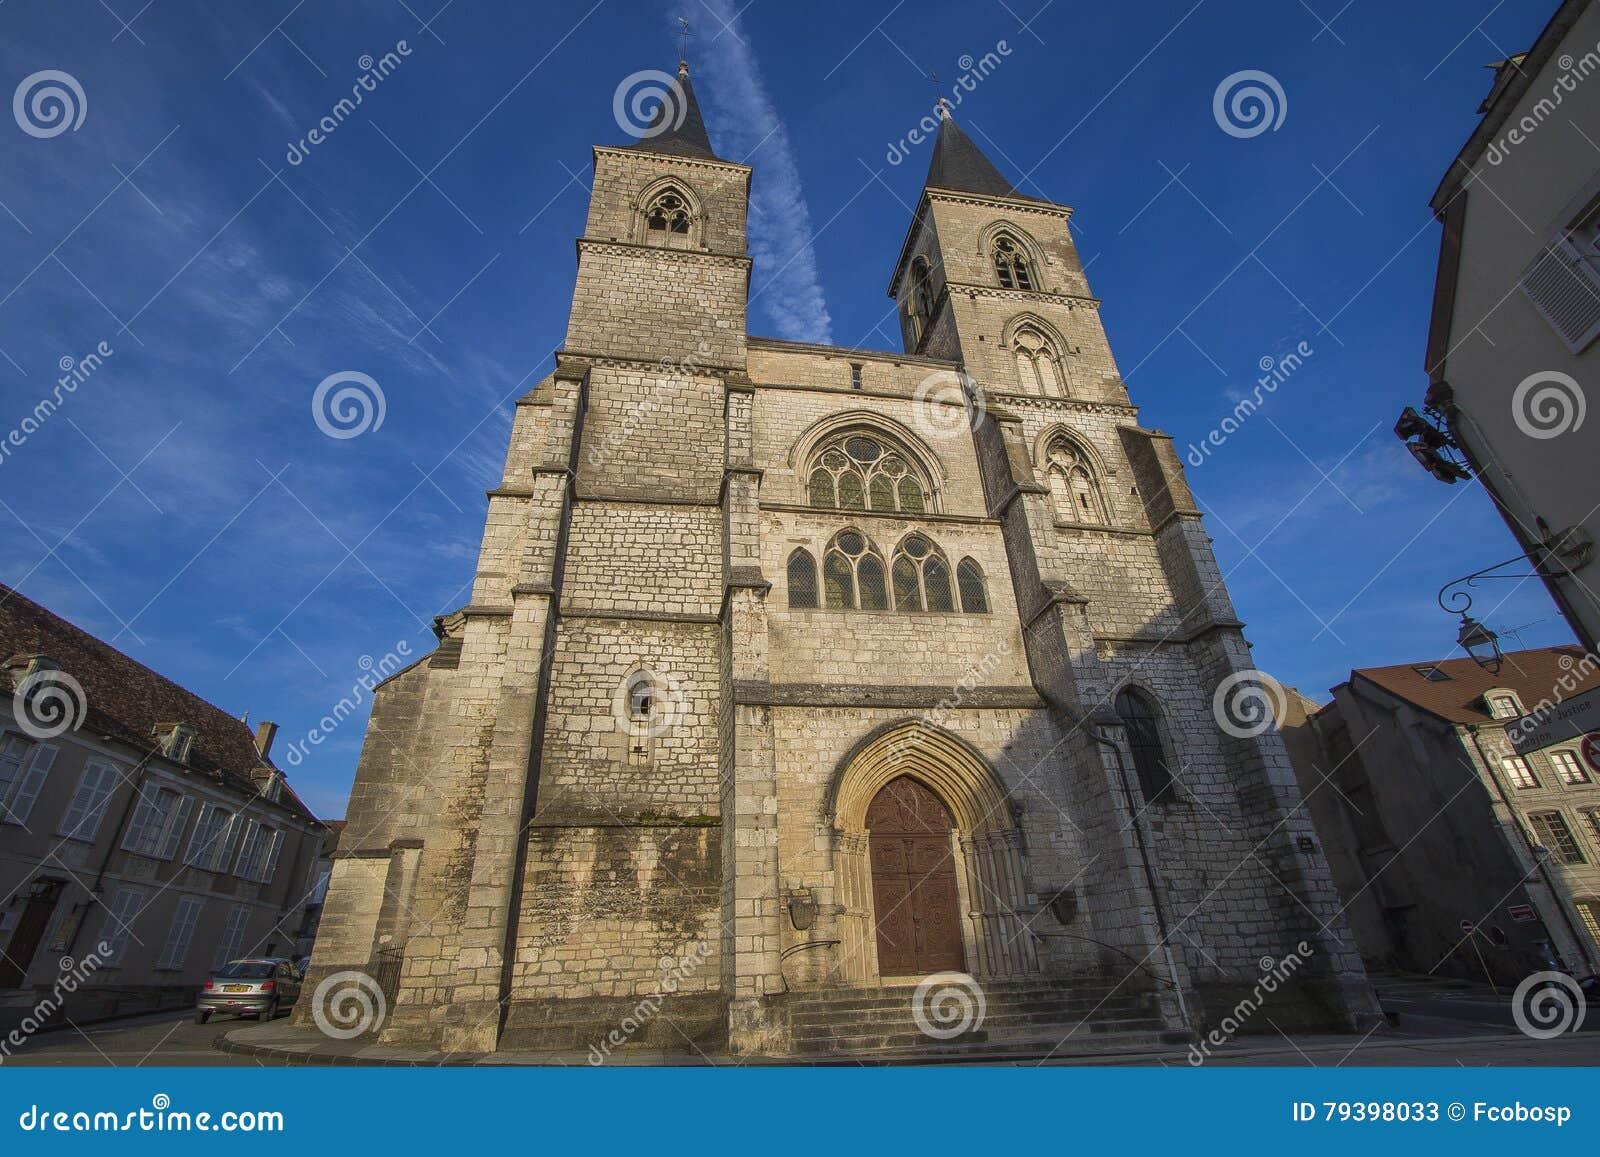 Cattedrale di Chaumont, Francia